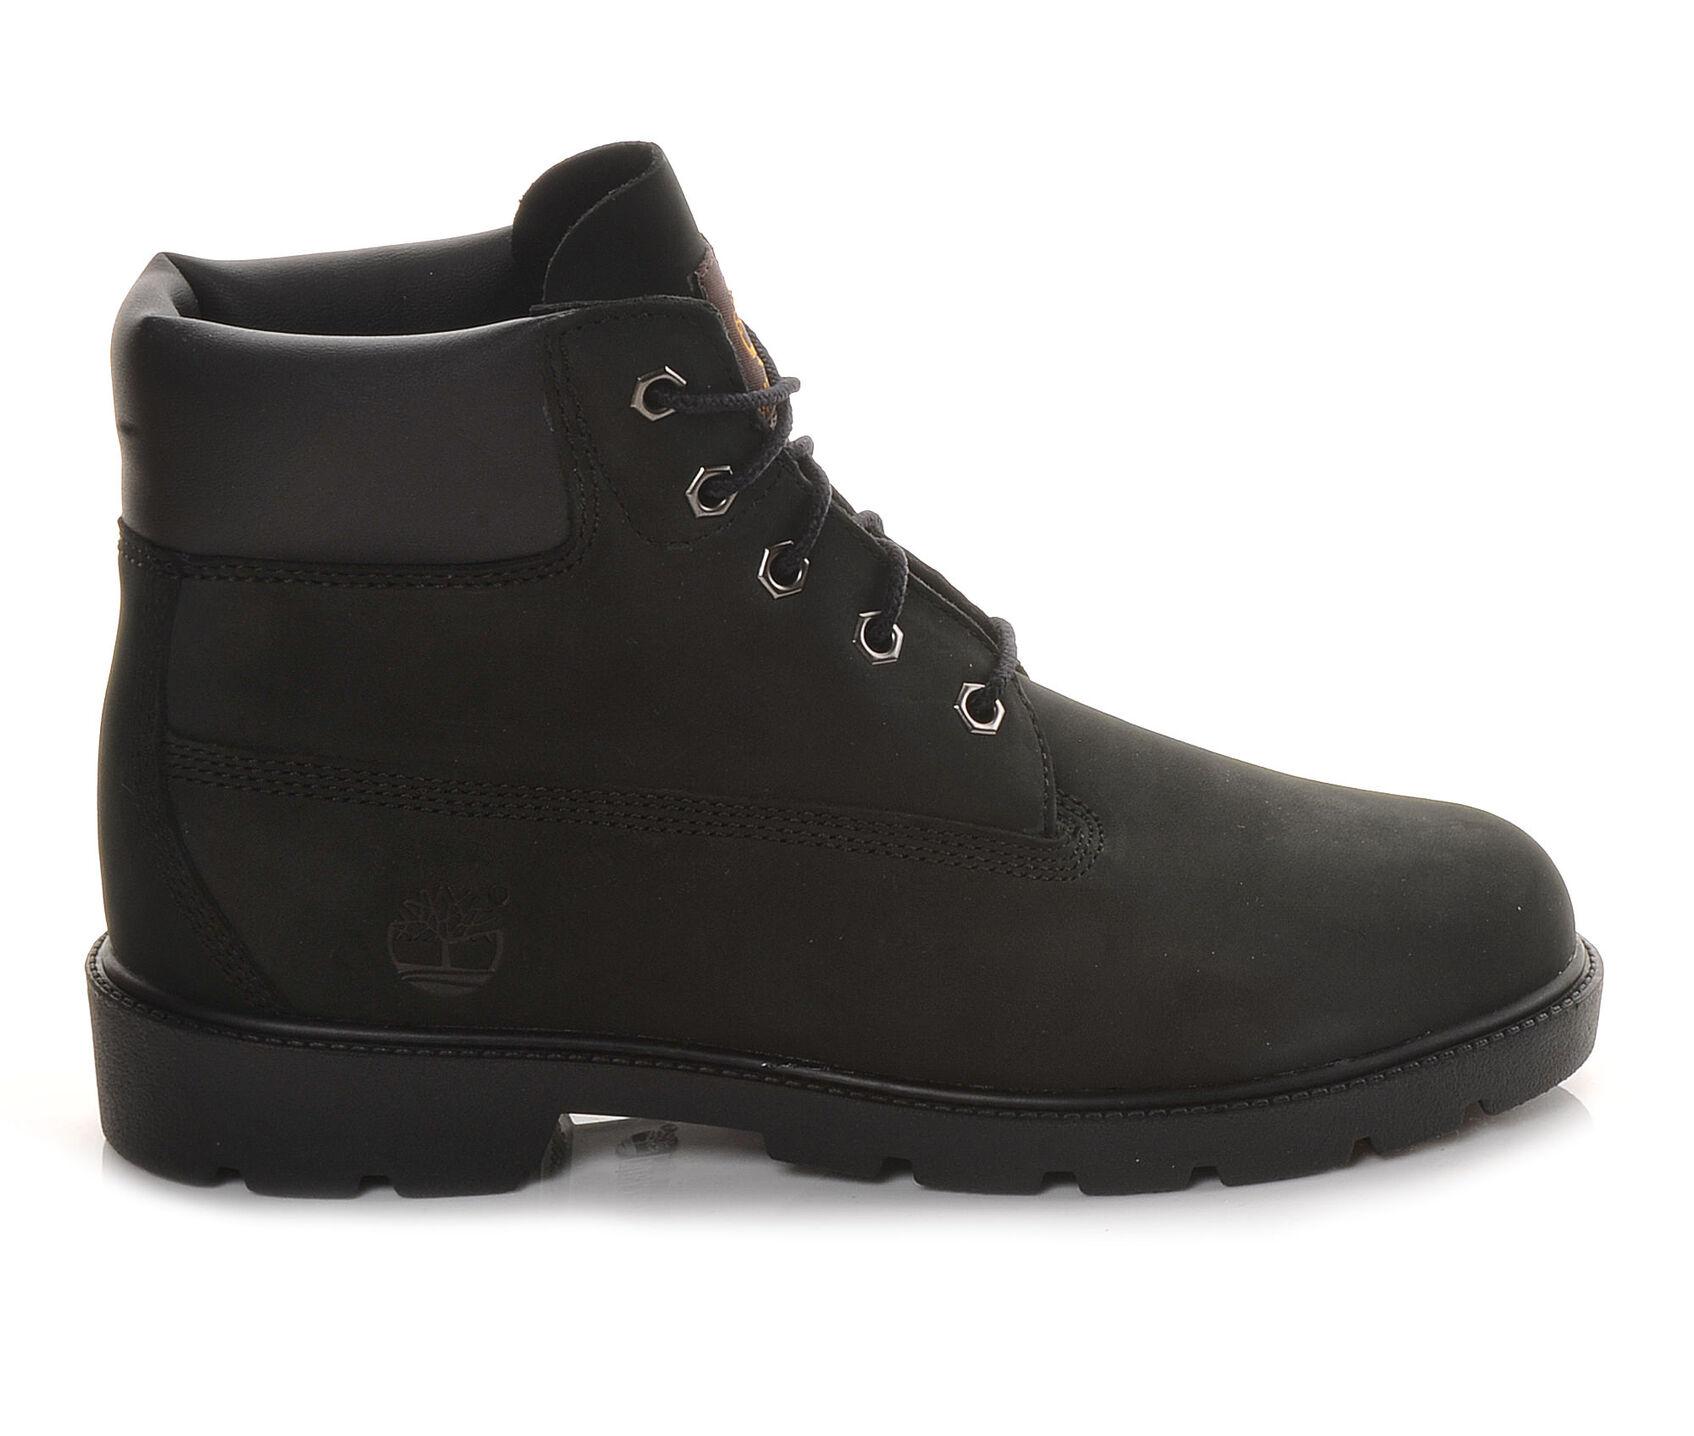 61f1ef879 Boys' Timberland Big Kid 10910 6 Inch Classic Boots | Shoe Carnival